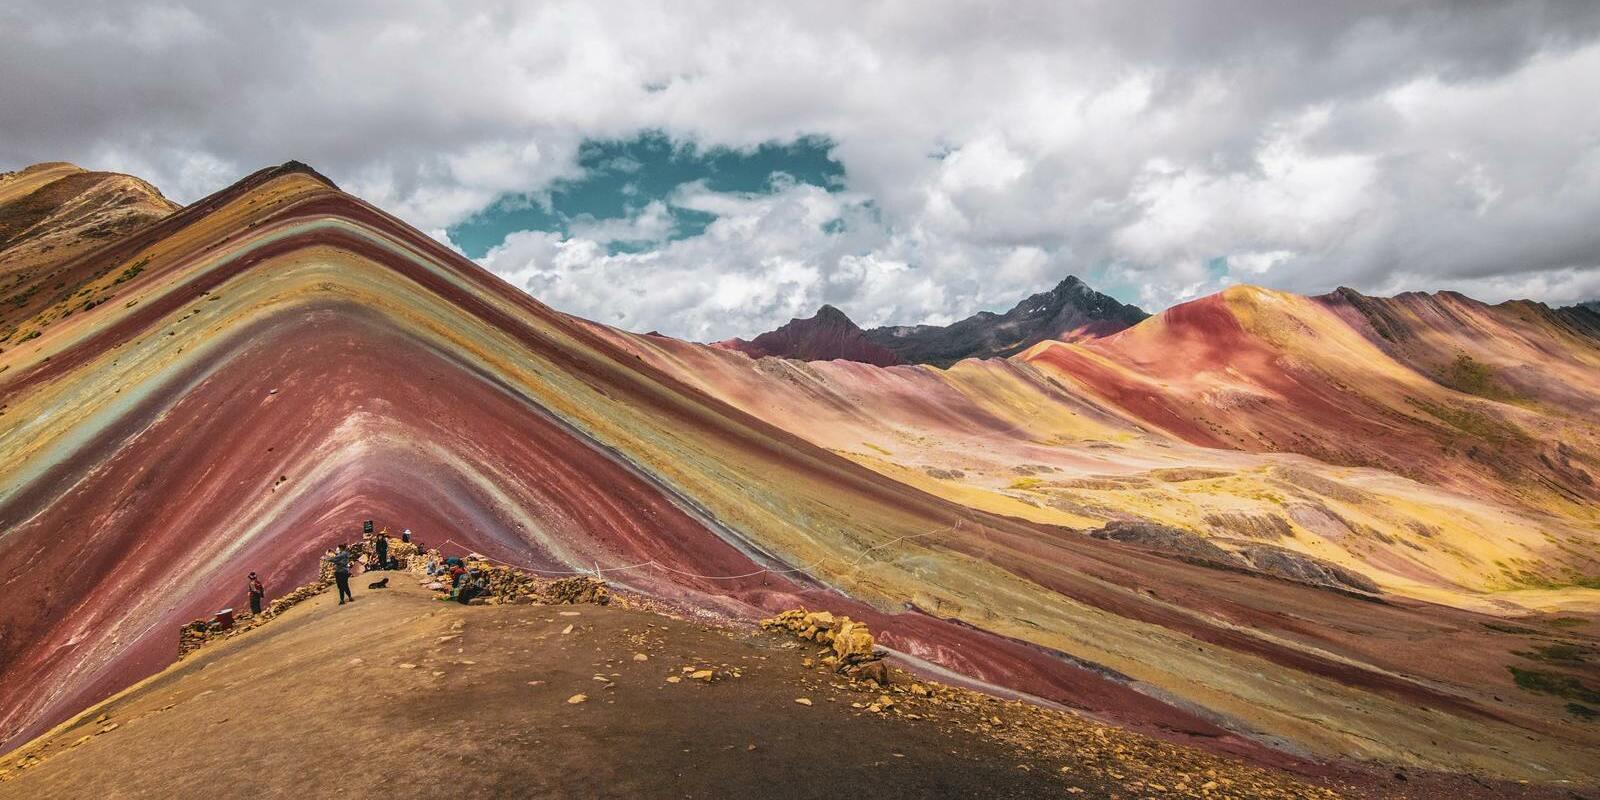 montagna-arcobaleno